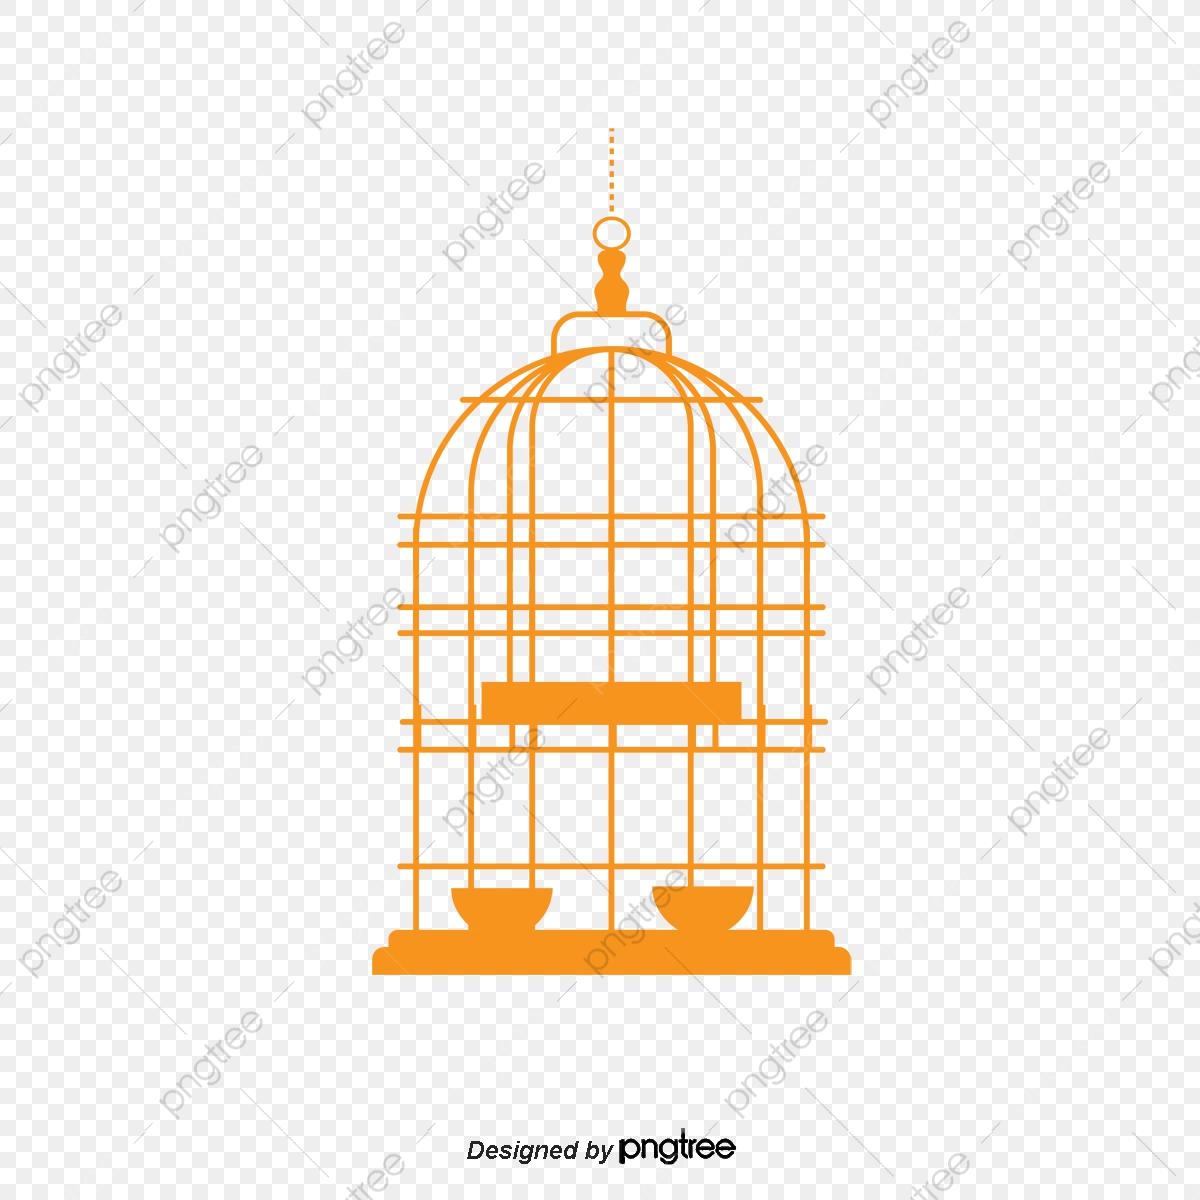 Hanging iron png transparent. Cage clipart golden bird